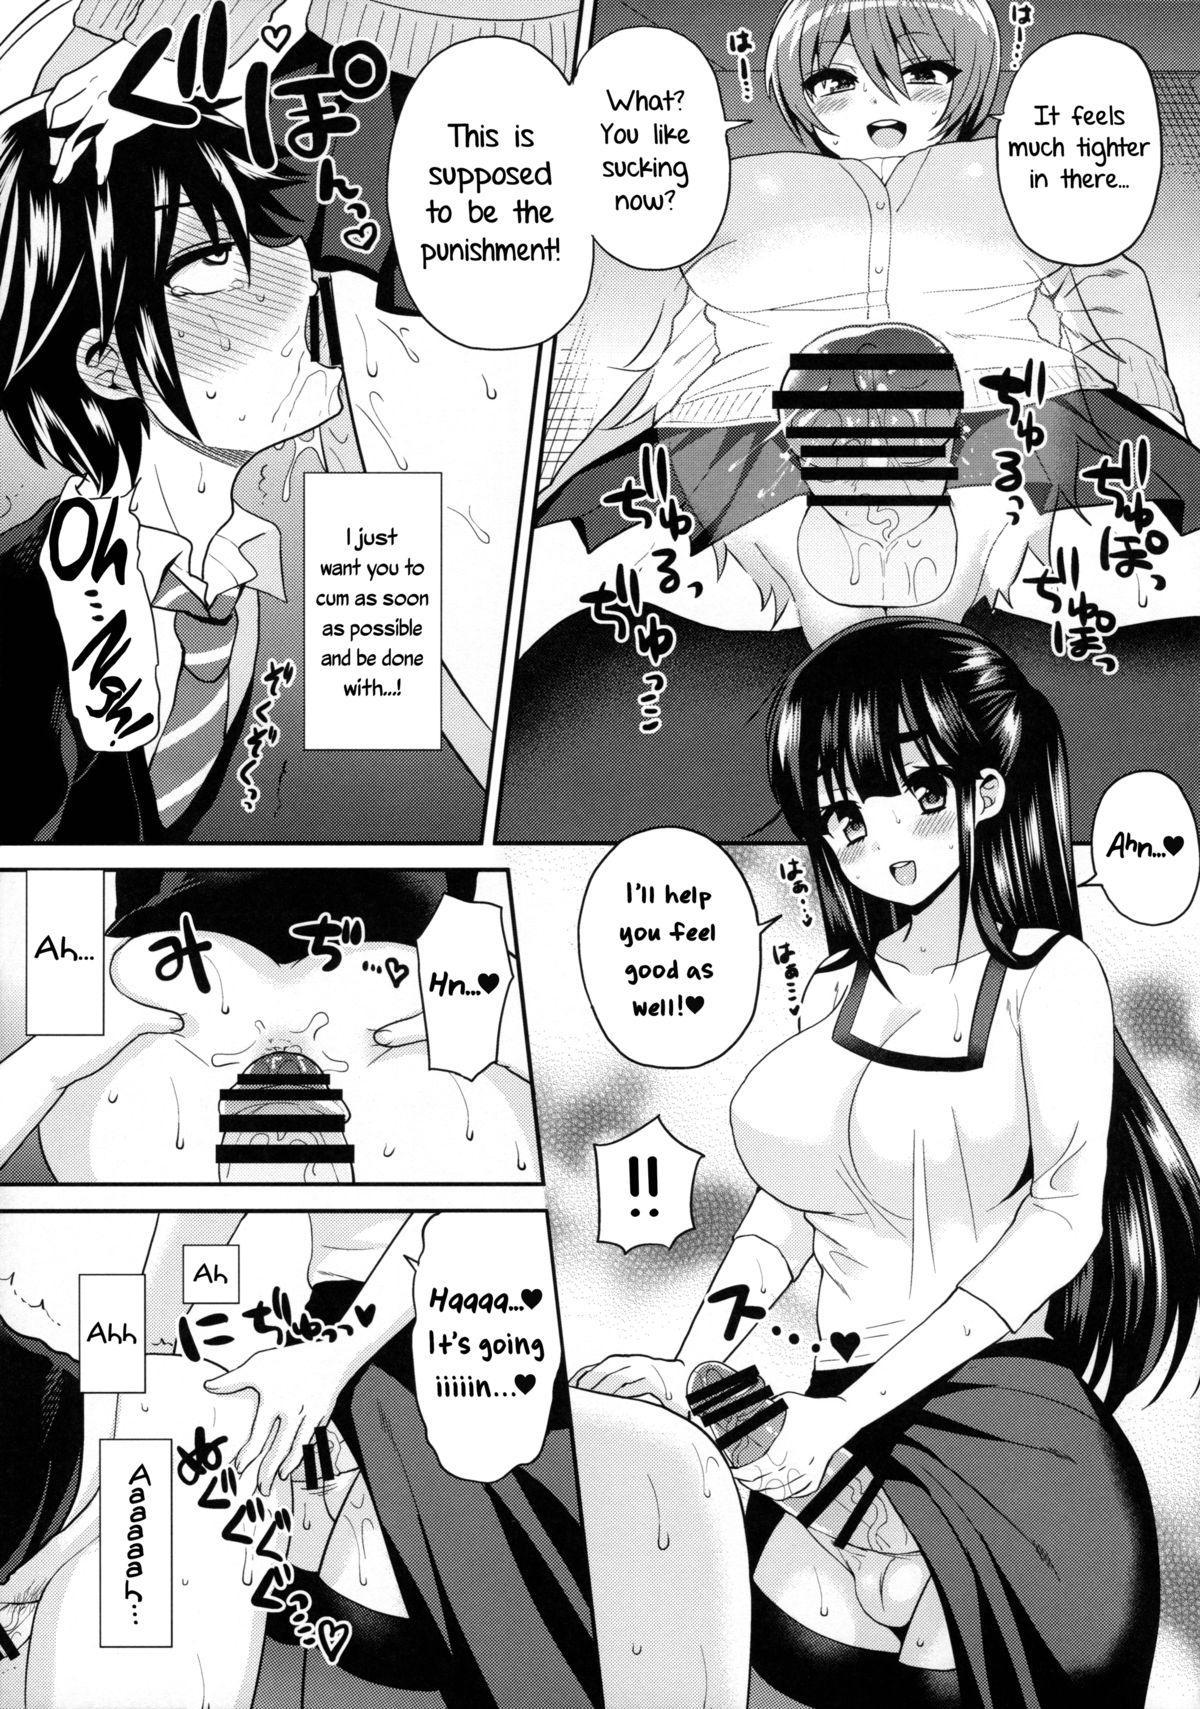 (C88) [Oshiruko Kan (Piririnegi)] Futanari! Oshioki Time 3 ~Shounen Saichoukyou Hen~   Futanari! Punishment Time 3 ~Boy's Retraining Chapter~ [English] =SW= 19